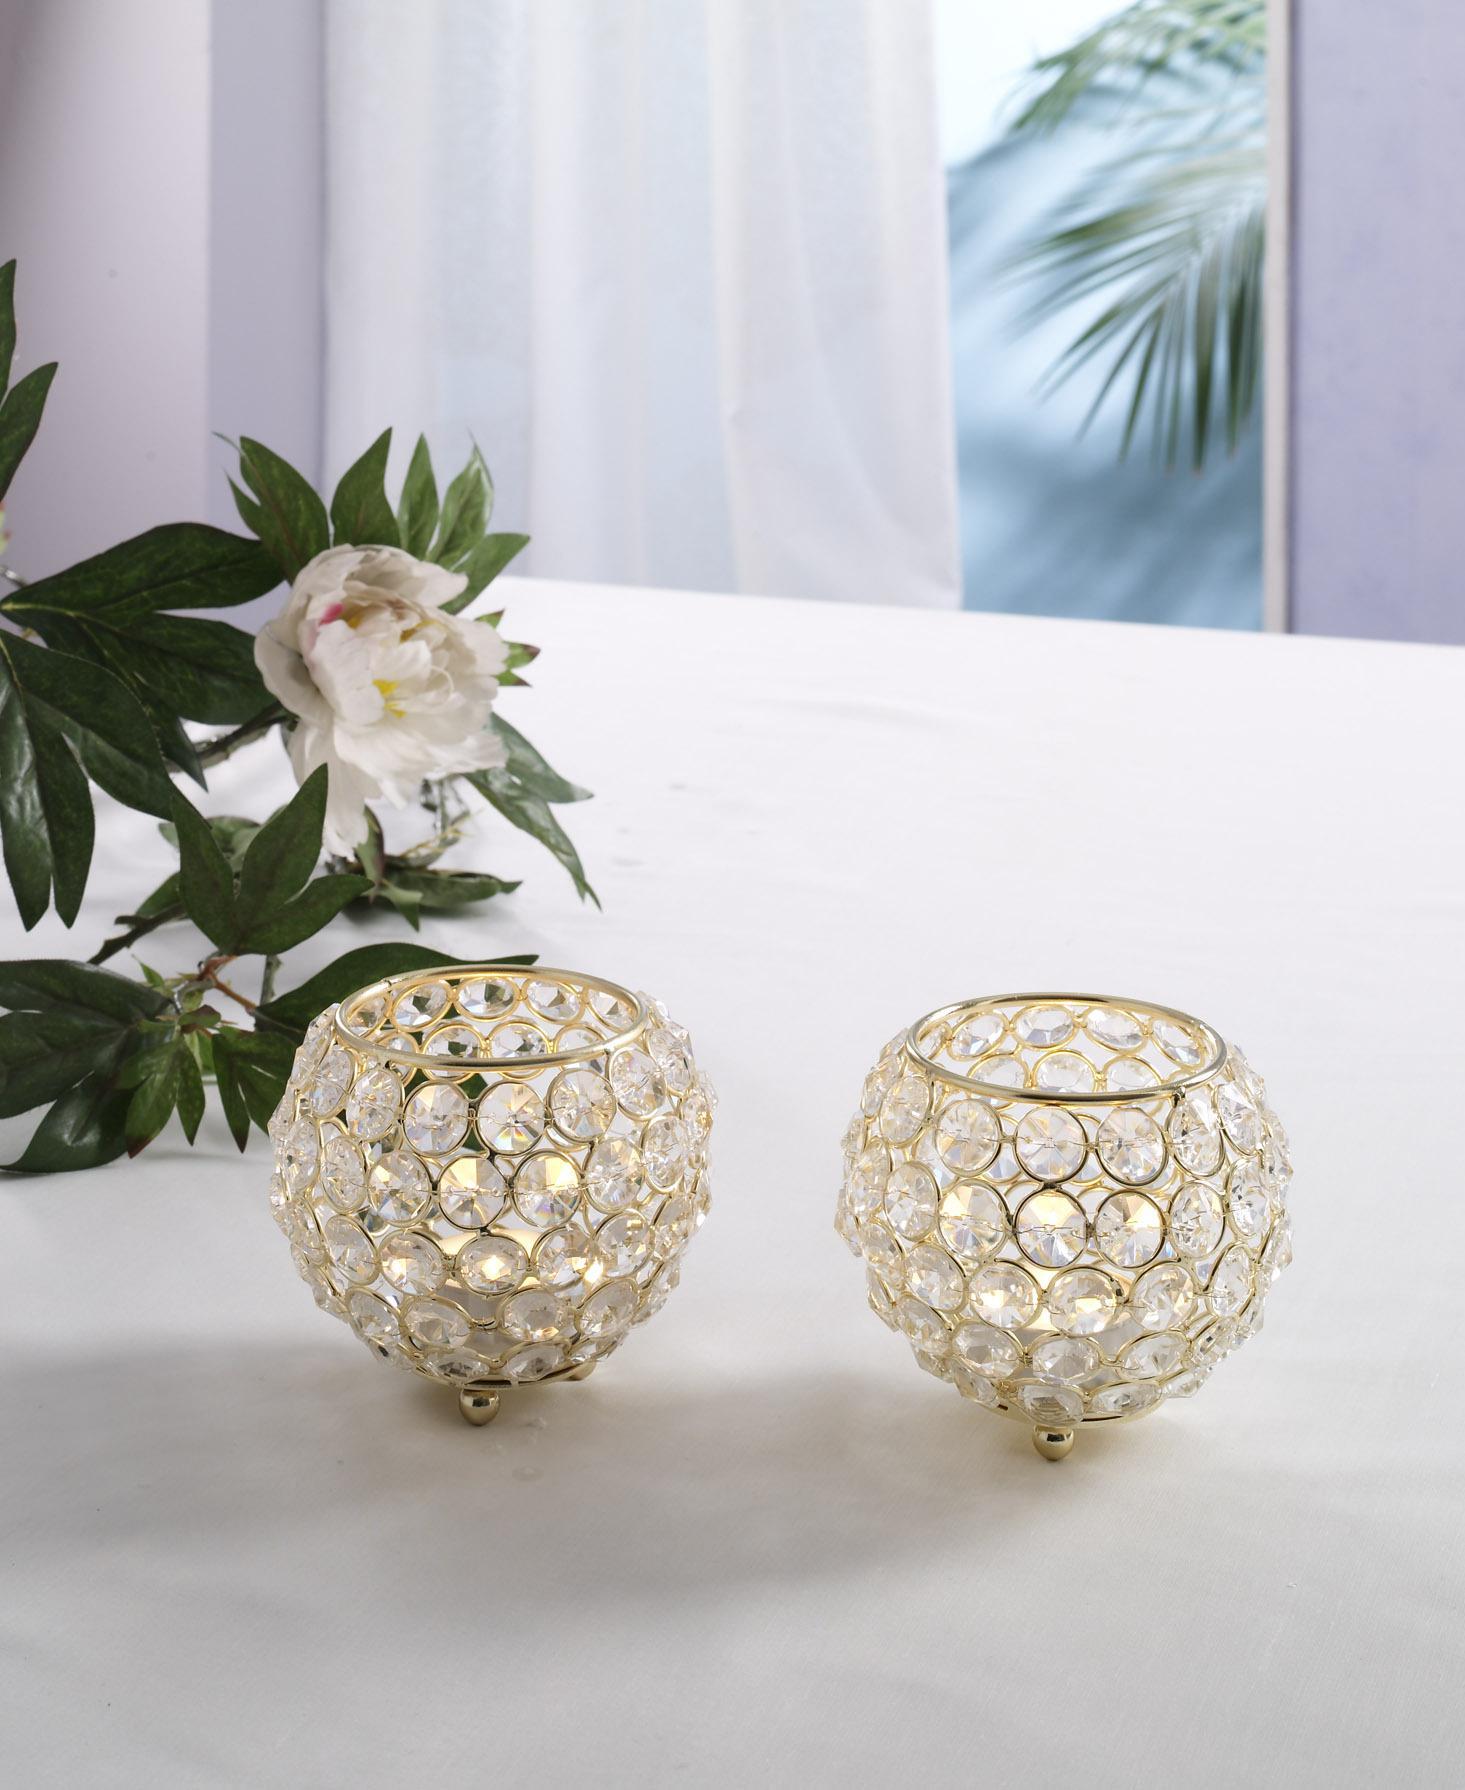 Kristall Kerzenstander Marie 2er Set Kugel 10 Cm In Gold Teelichthalter Kerzenhalter Tafel Hochzeit Feier Teelichthalter Kerzenleuchter Tischdeko